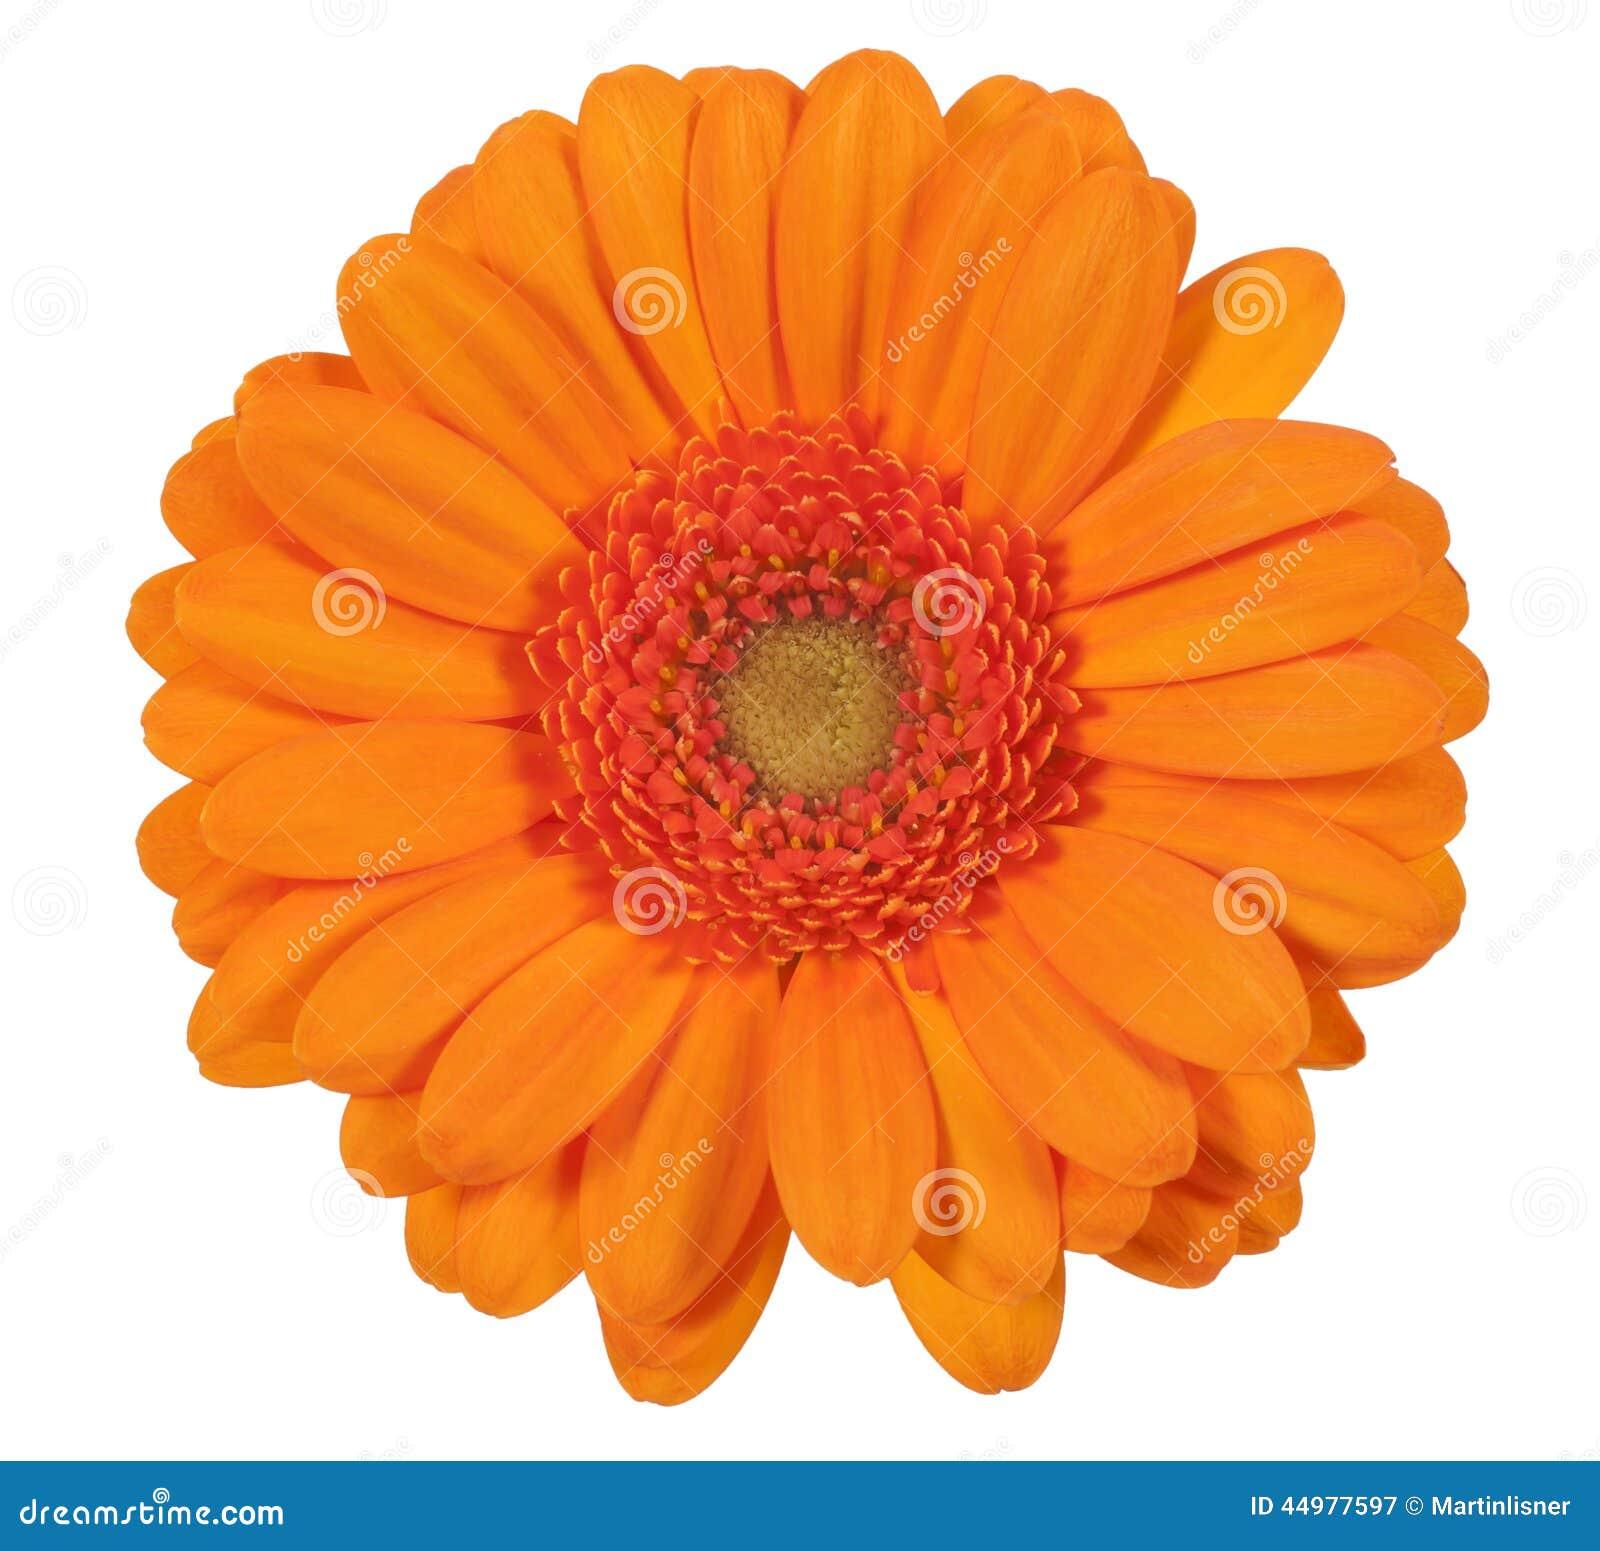 Dating orange